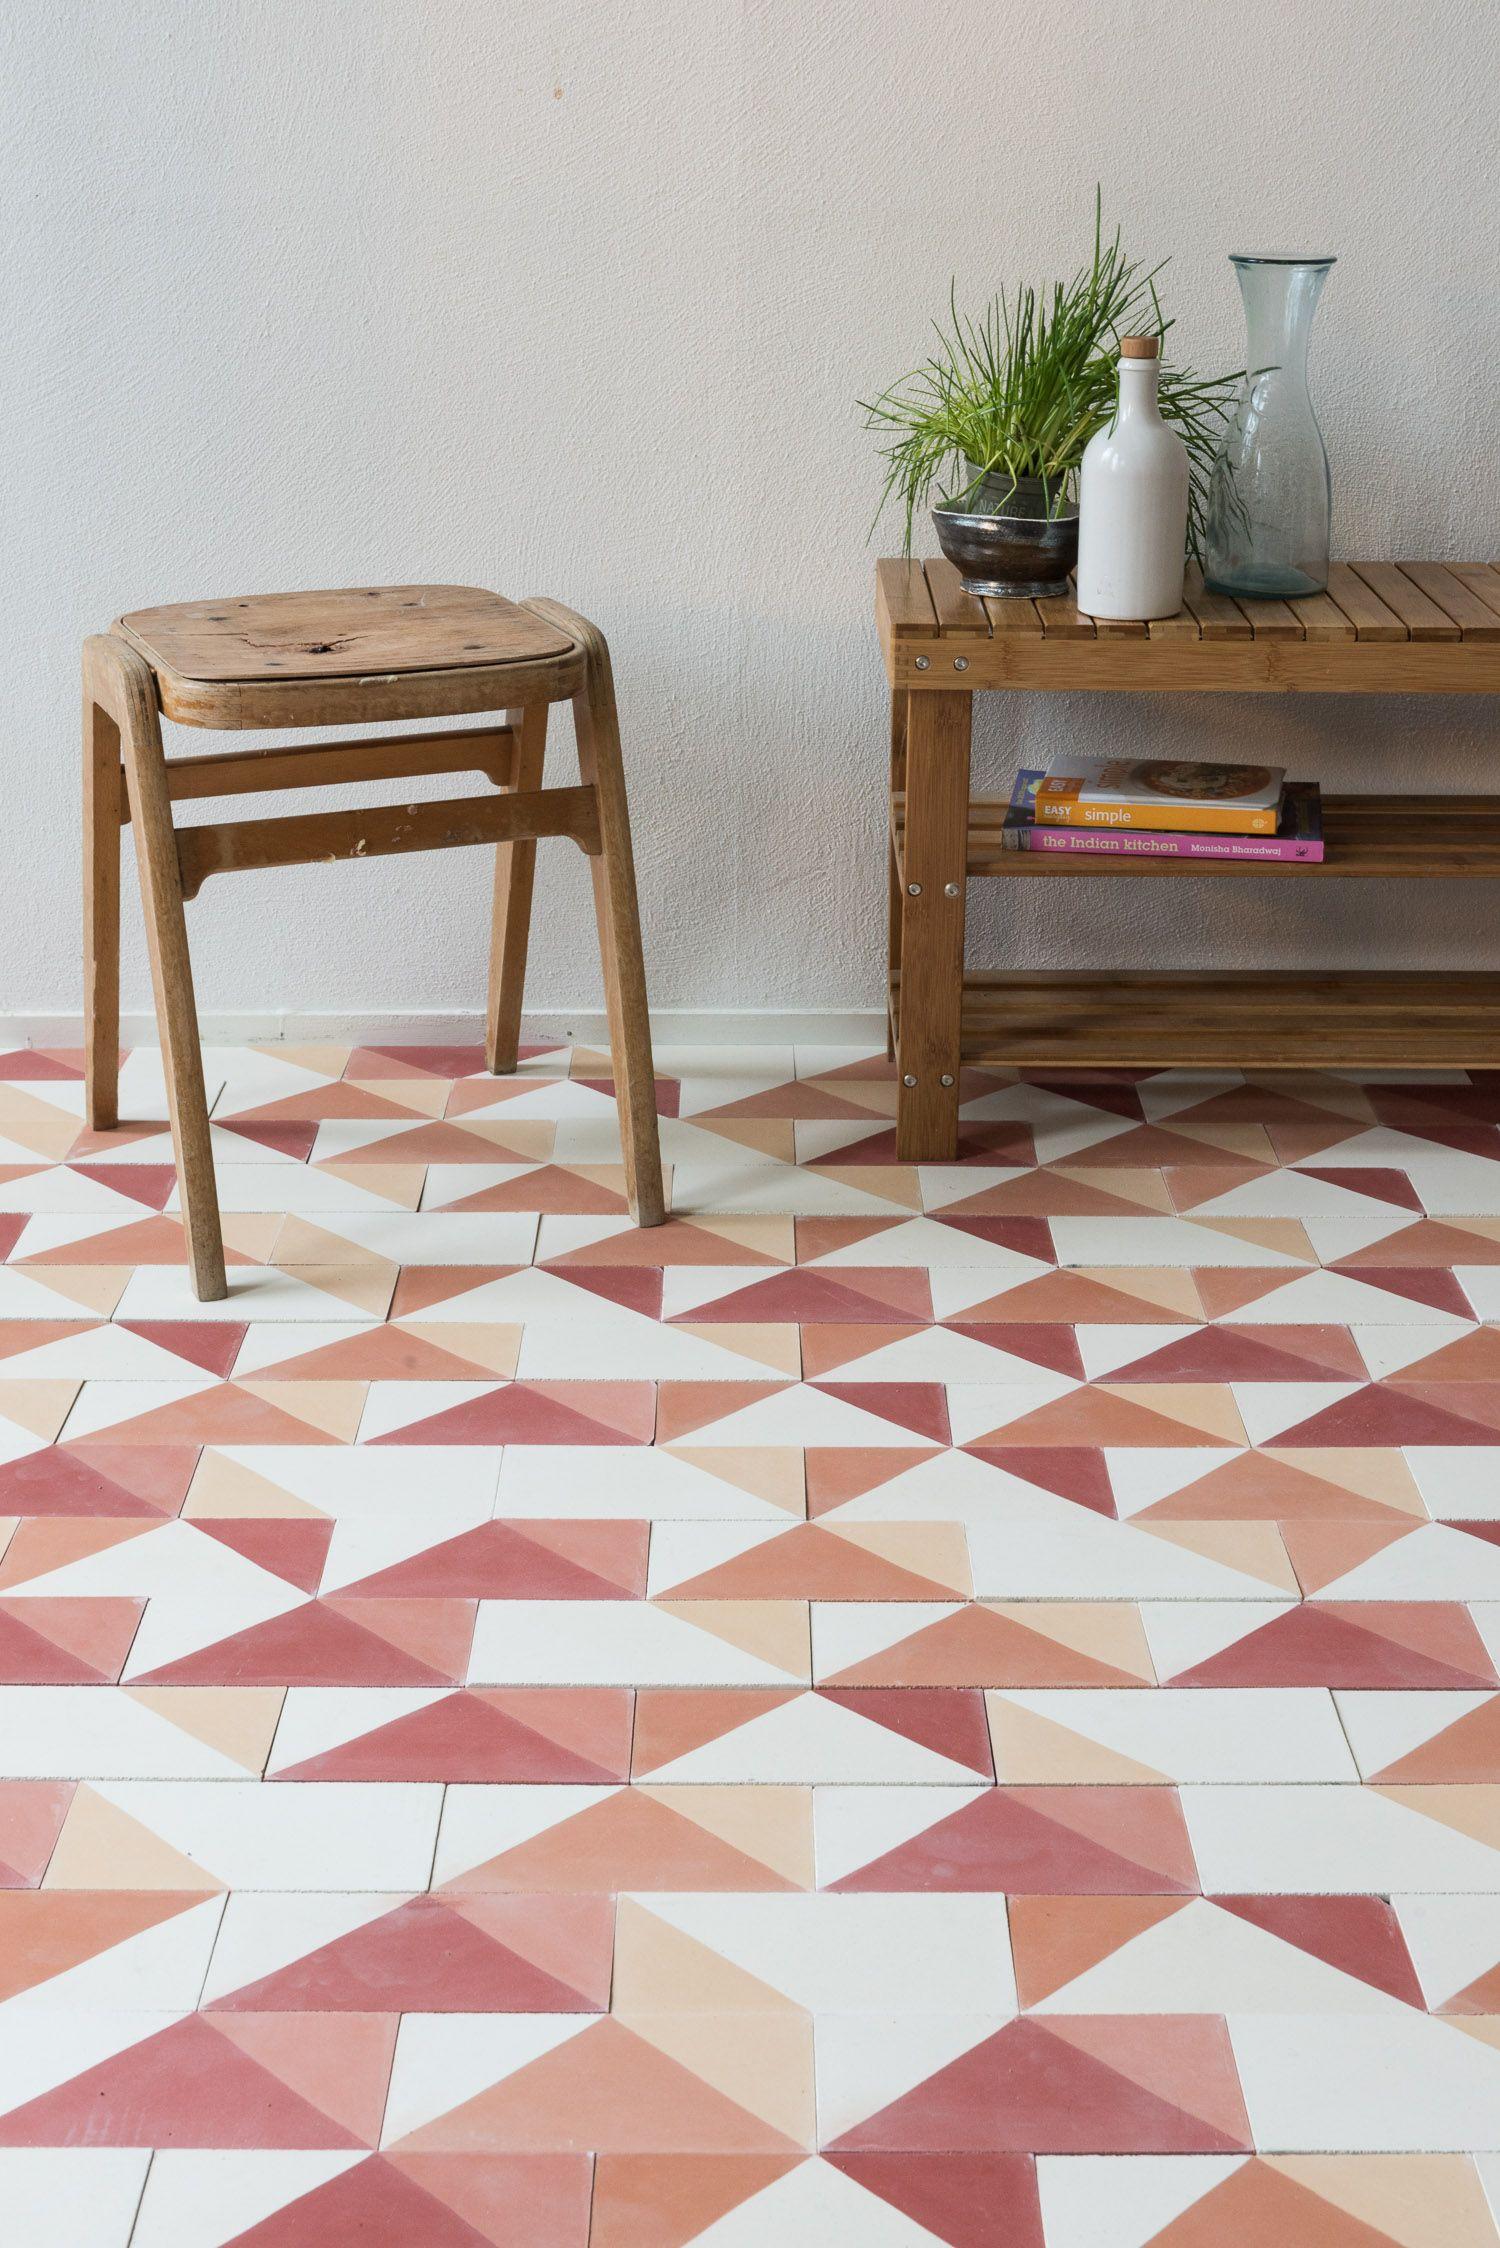 Pin By Micaela Gonzalez On Design Home Interiors Concrete Tiles Ceramic Wall Tiles Patio Decor